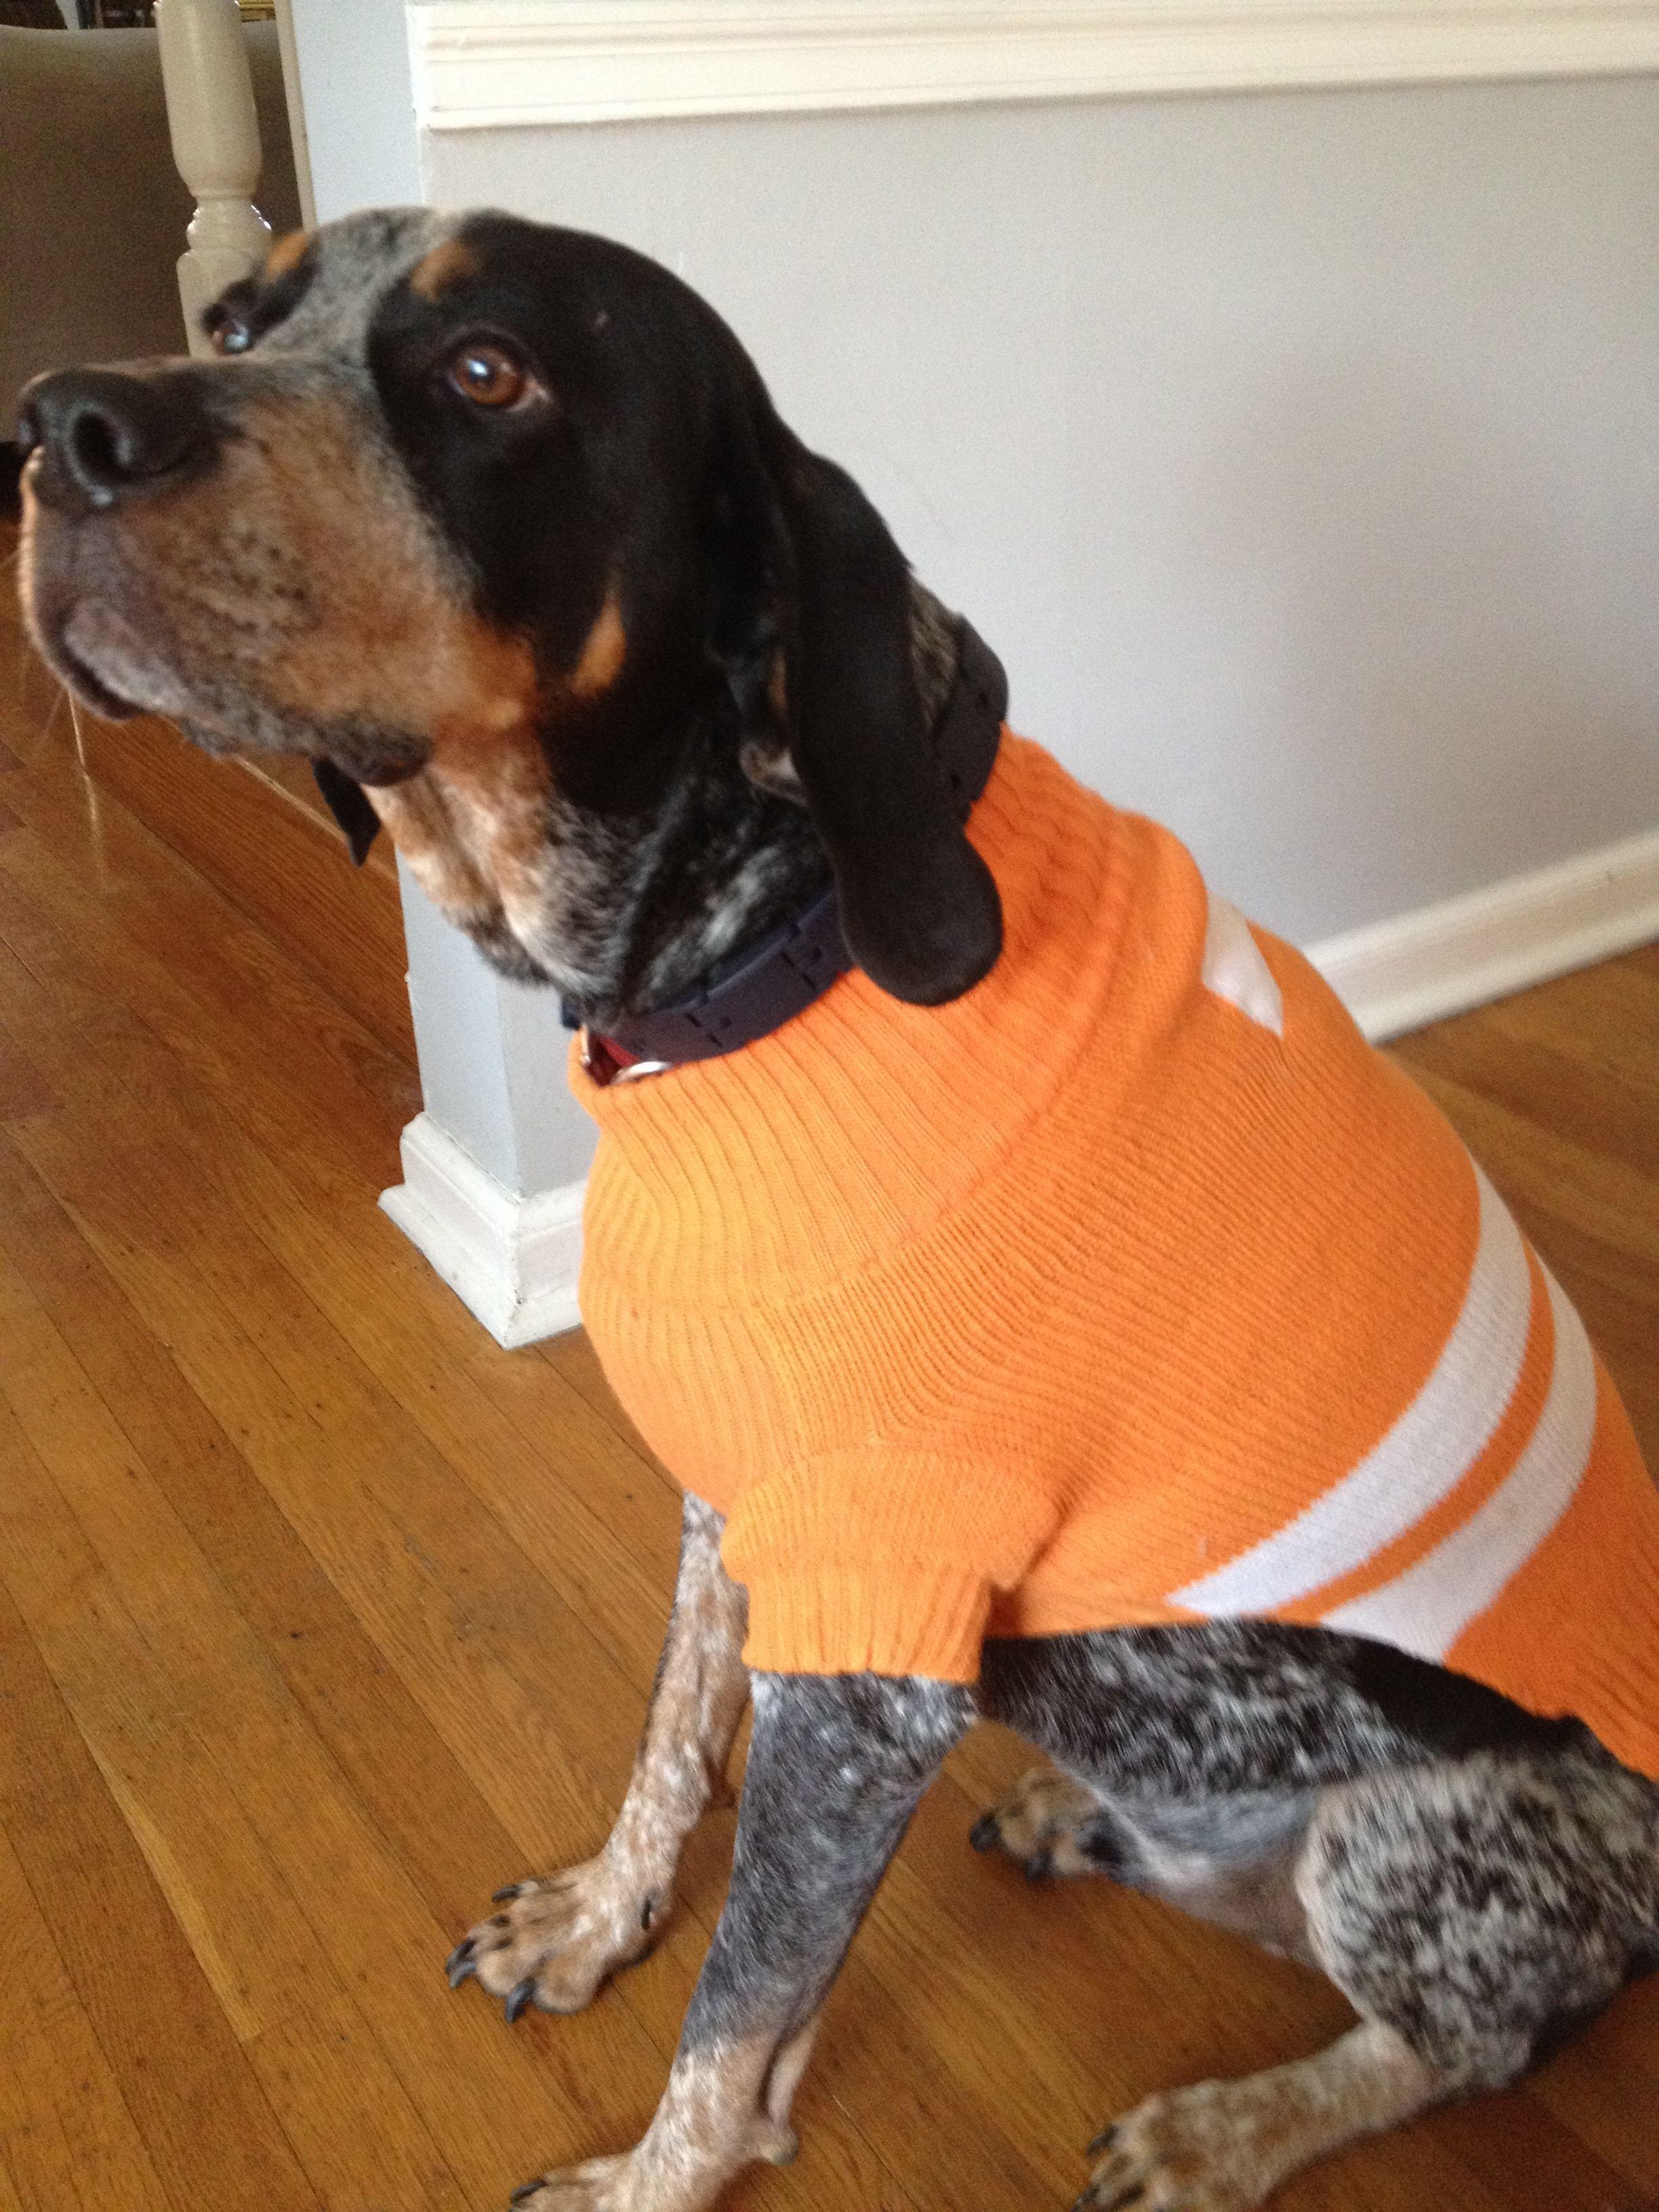 My blue tick hound dog sporting a TN sweater. Go Vols